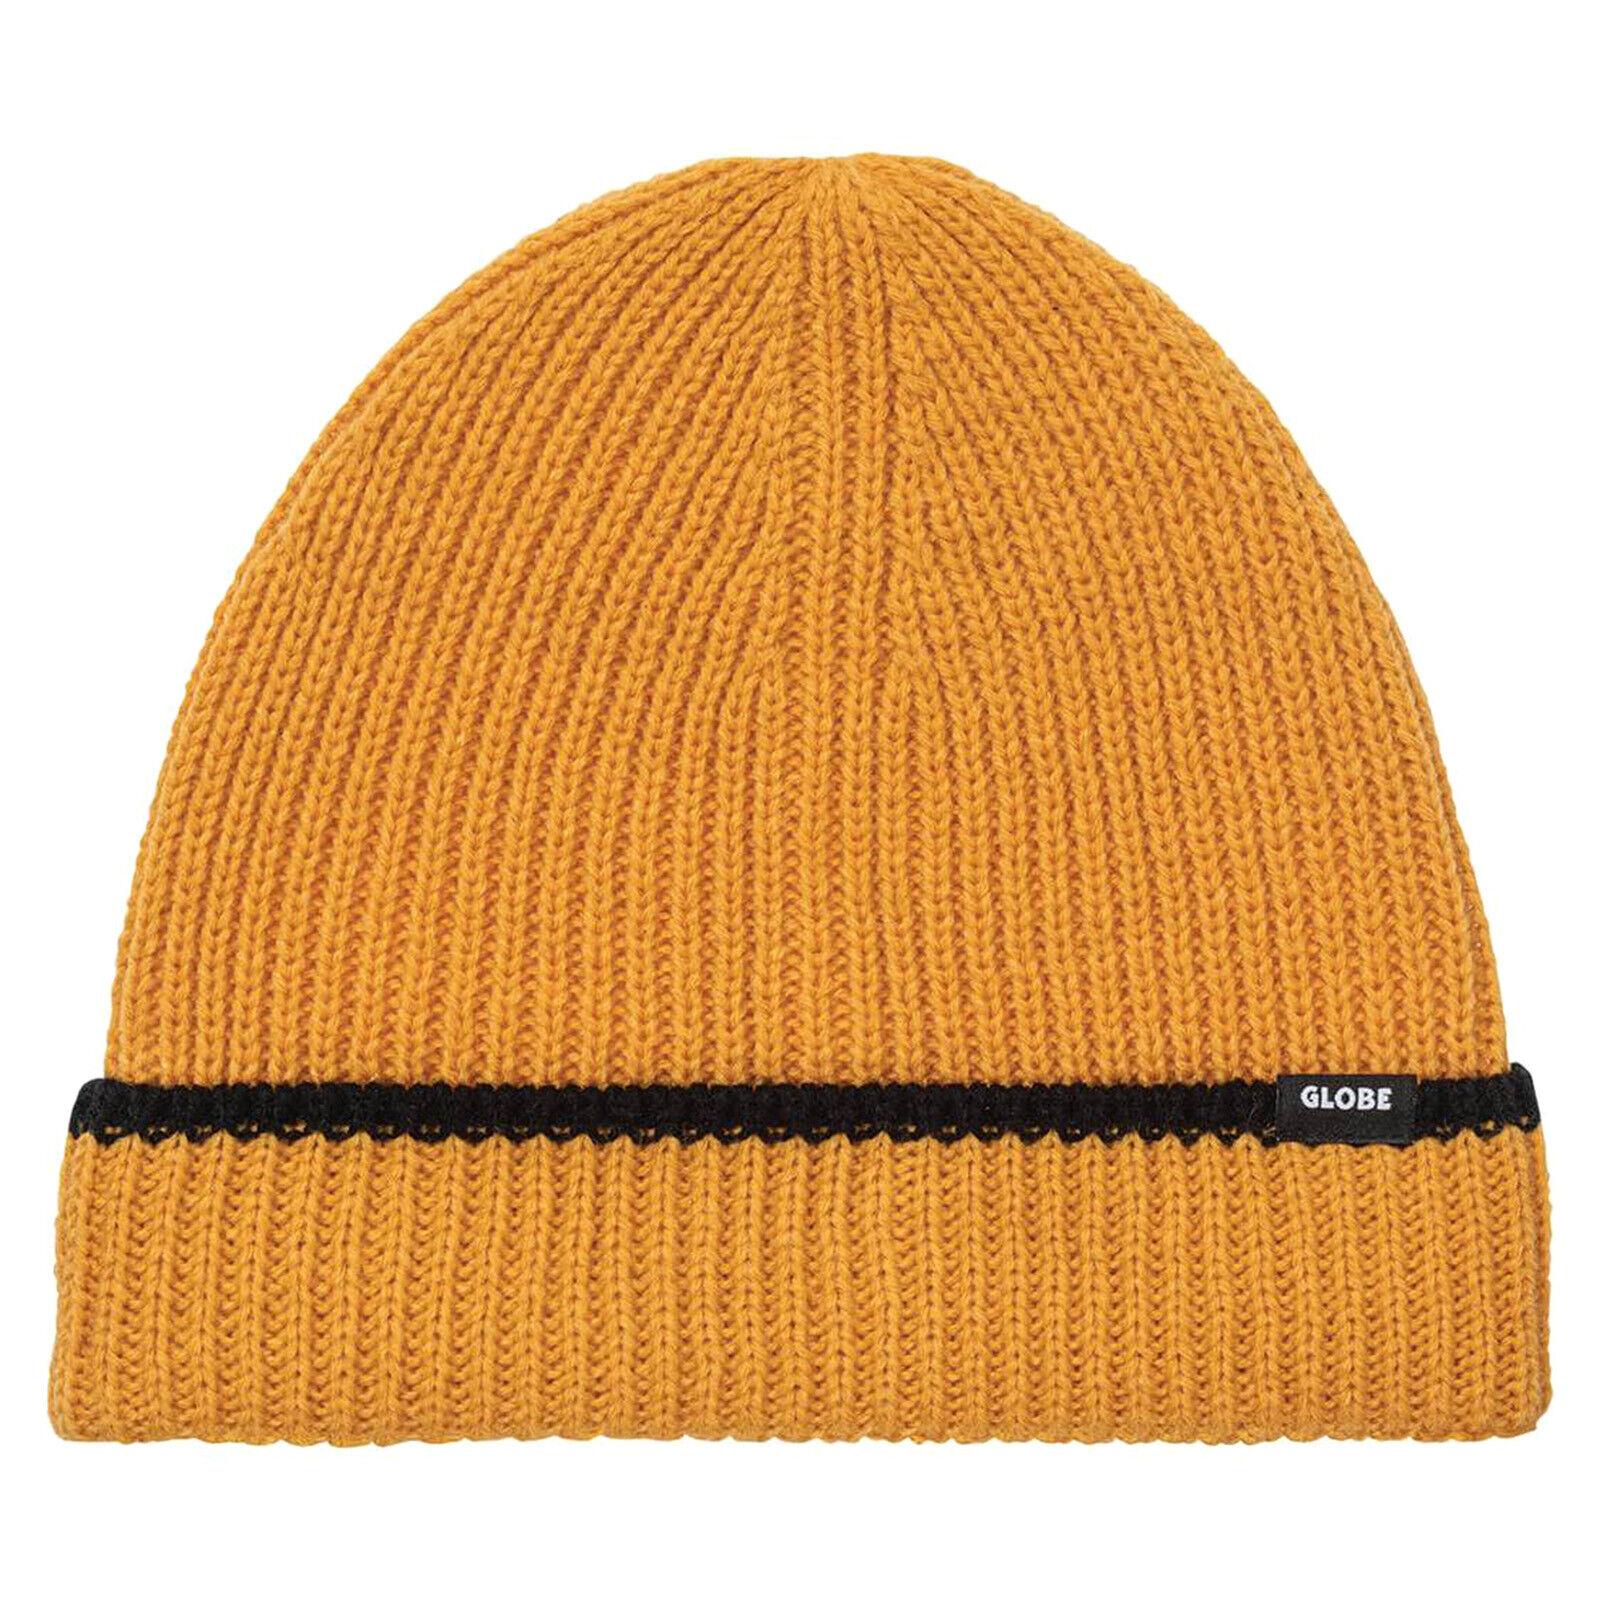 GLOBE Liner Beanie Hat - Gold - Kappe A Beanie Gelb